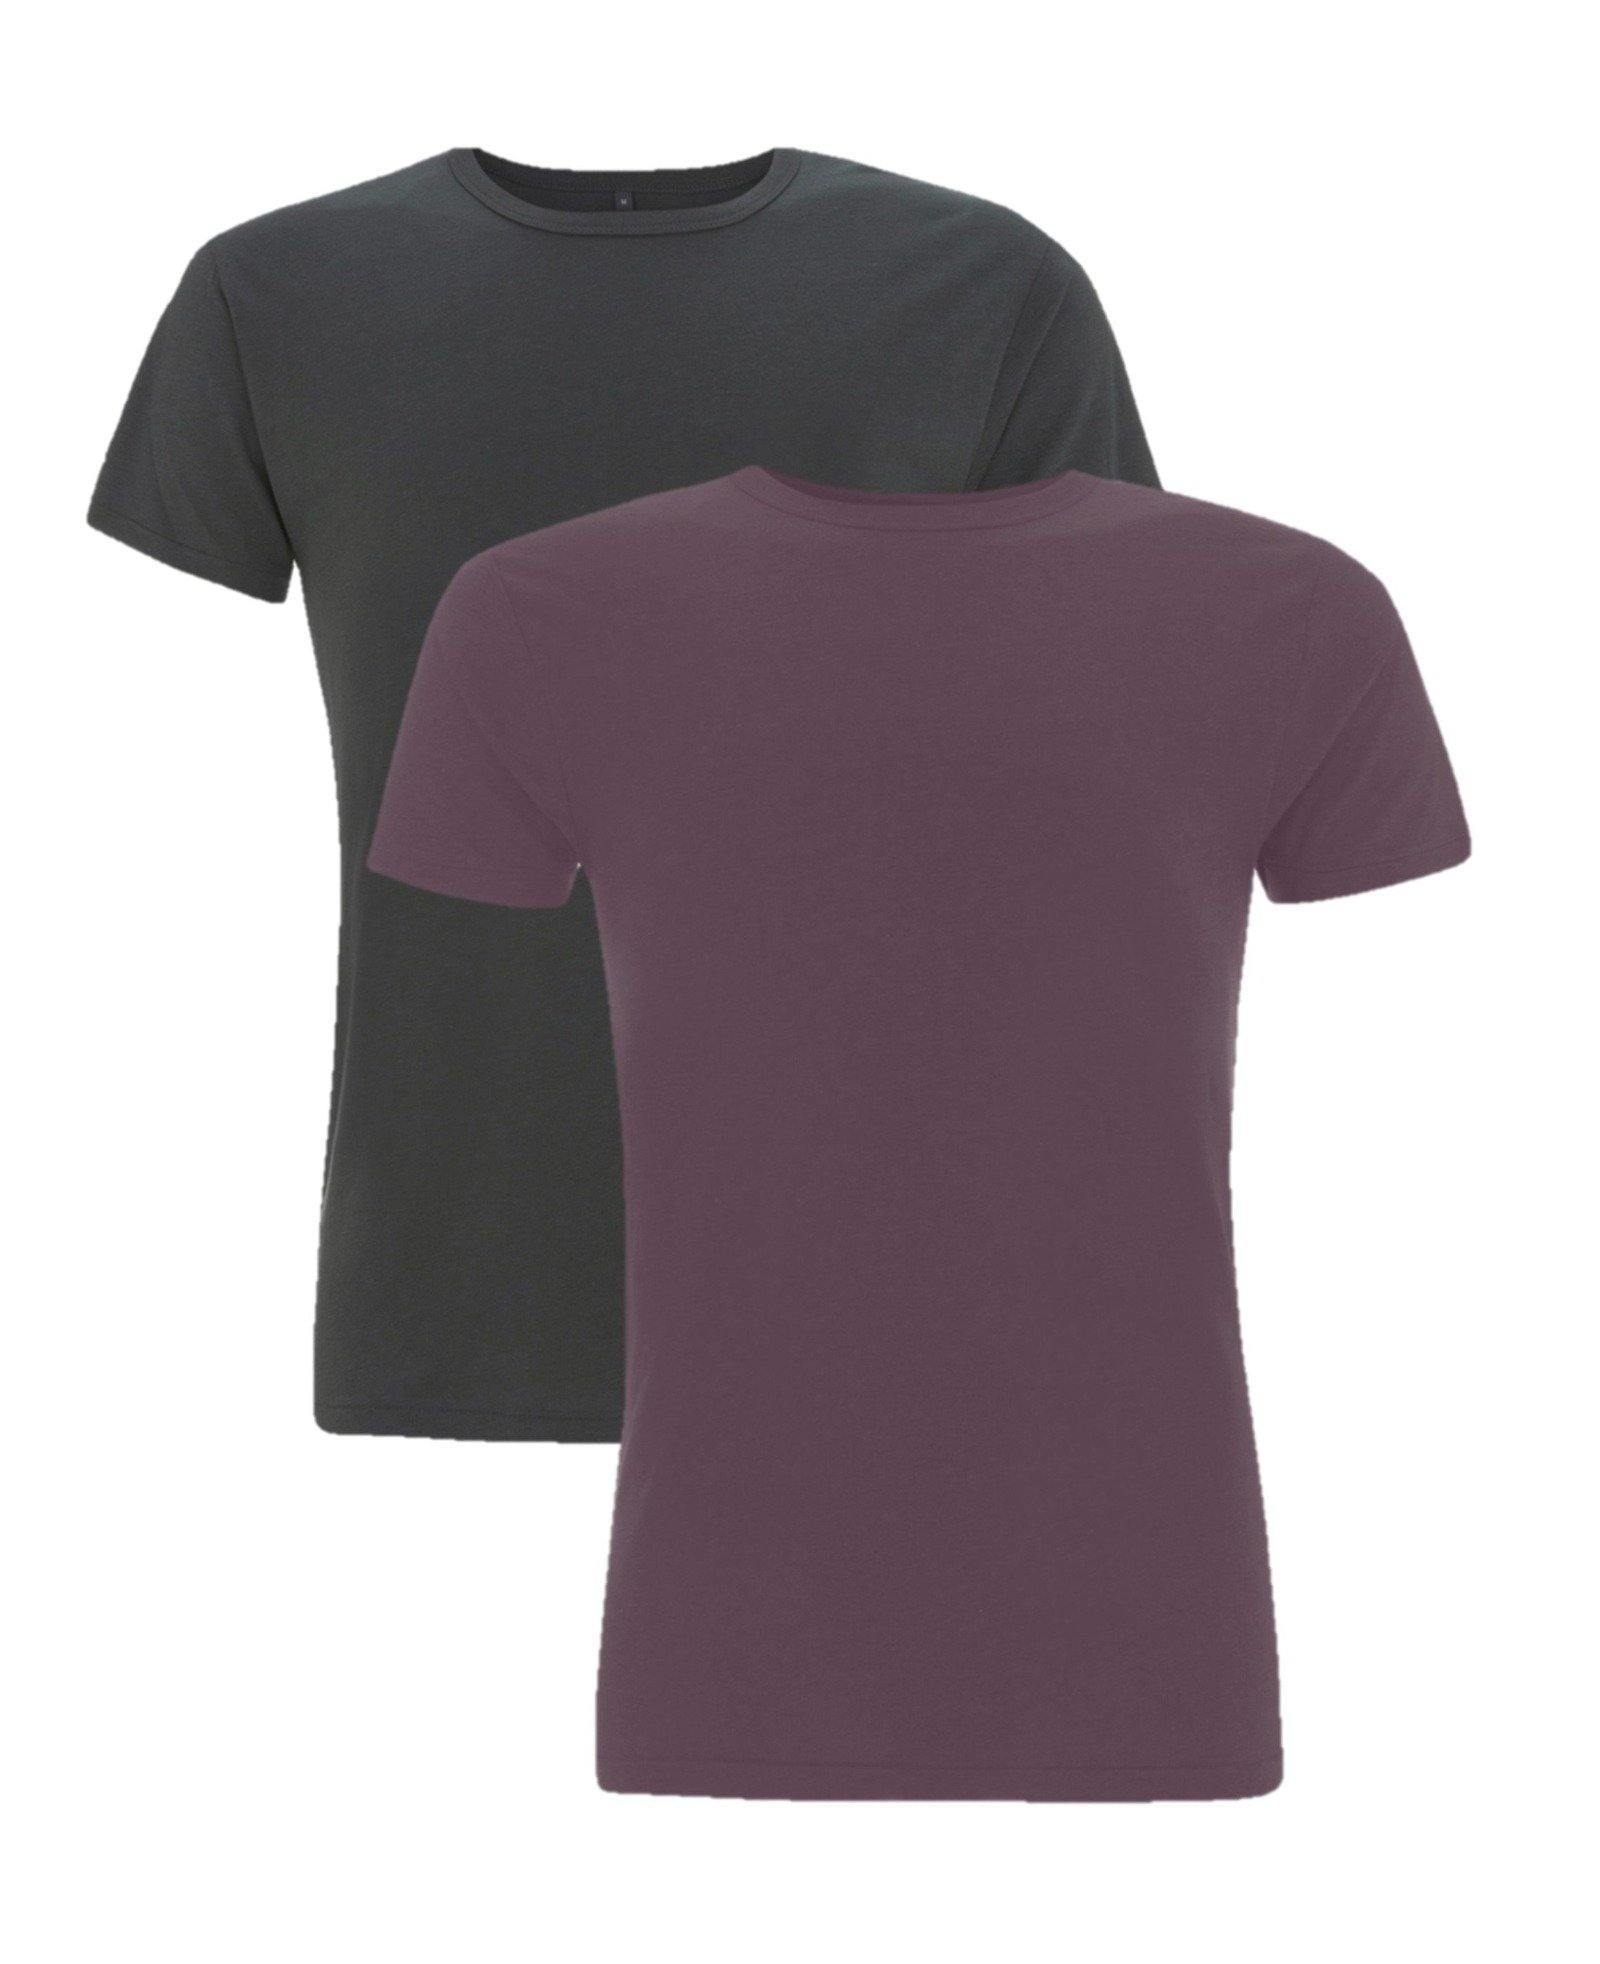 Bamboe t-shirt heren 2-pack mix | Cayboo